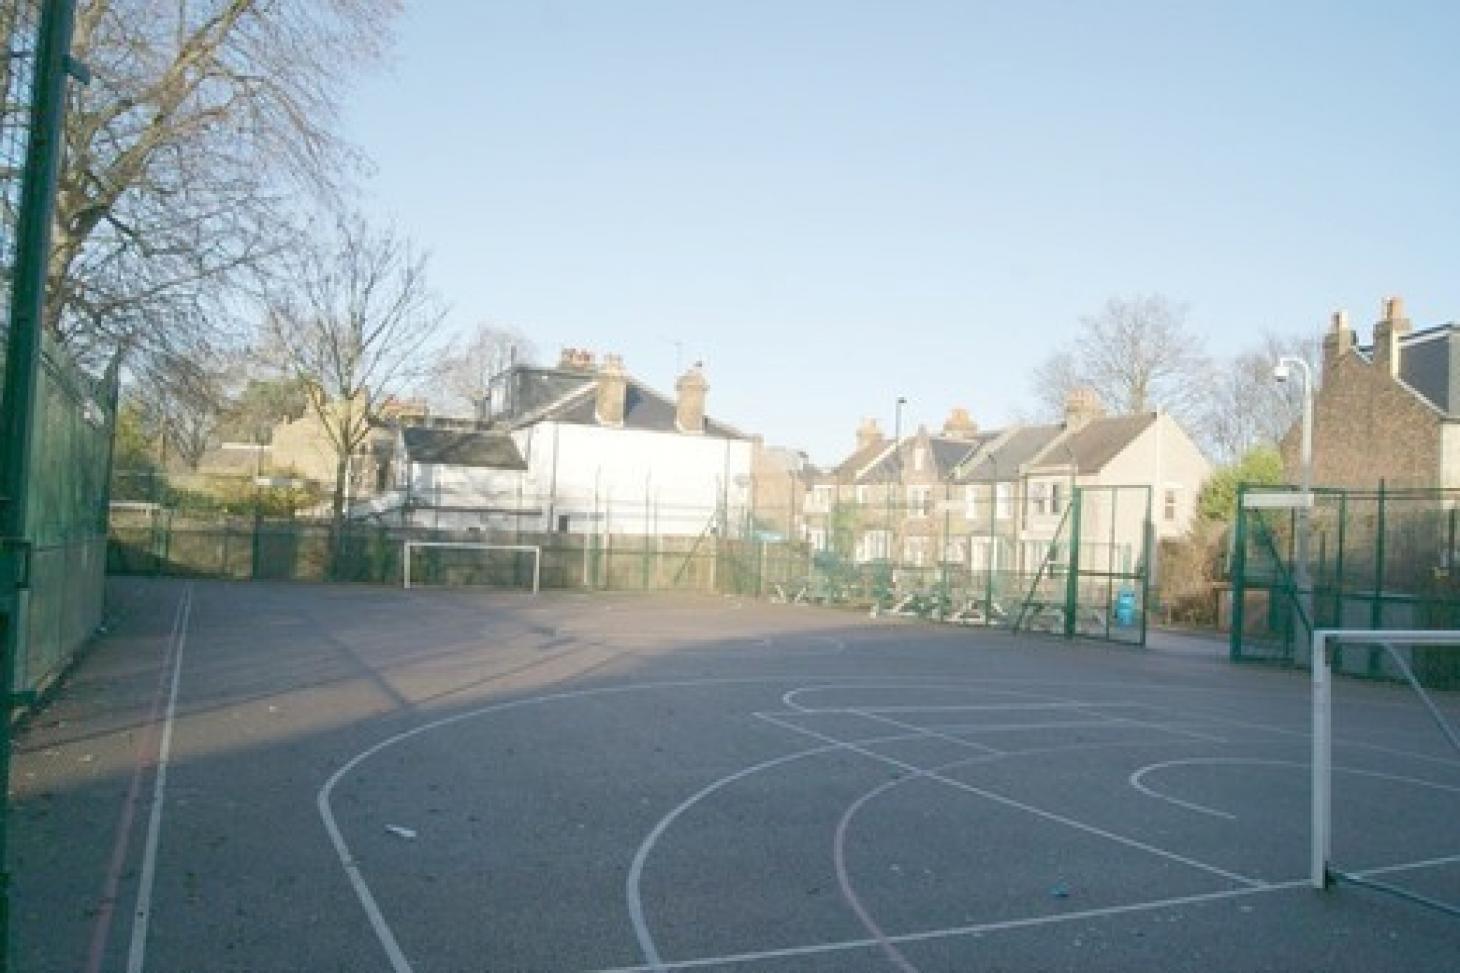 Trinity Secondary School, Lewisham 5 a side   Concrete football pitch